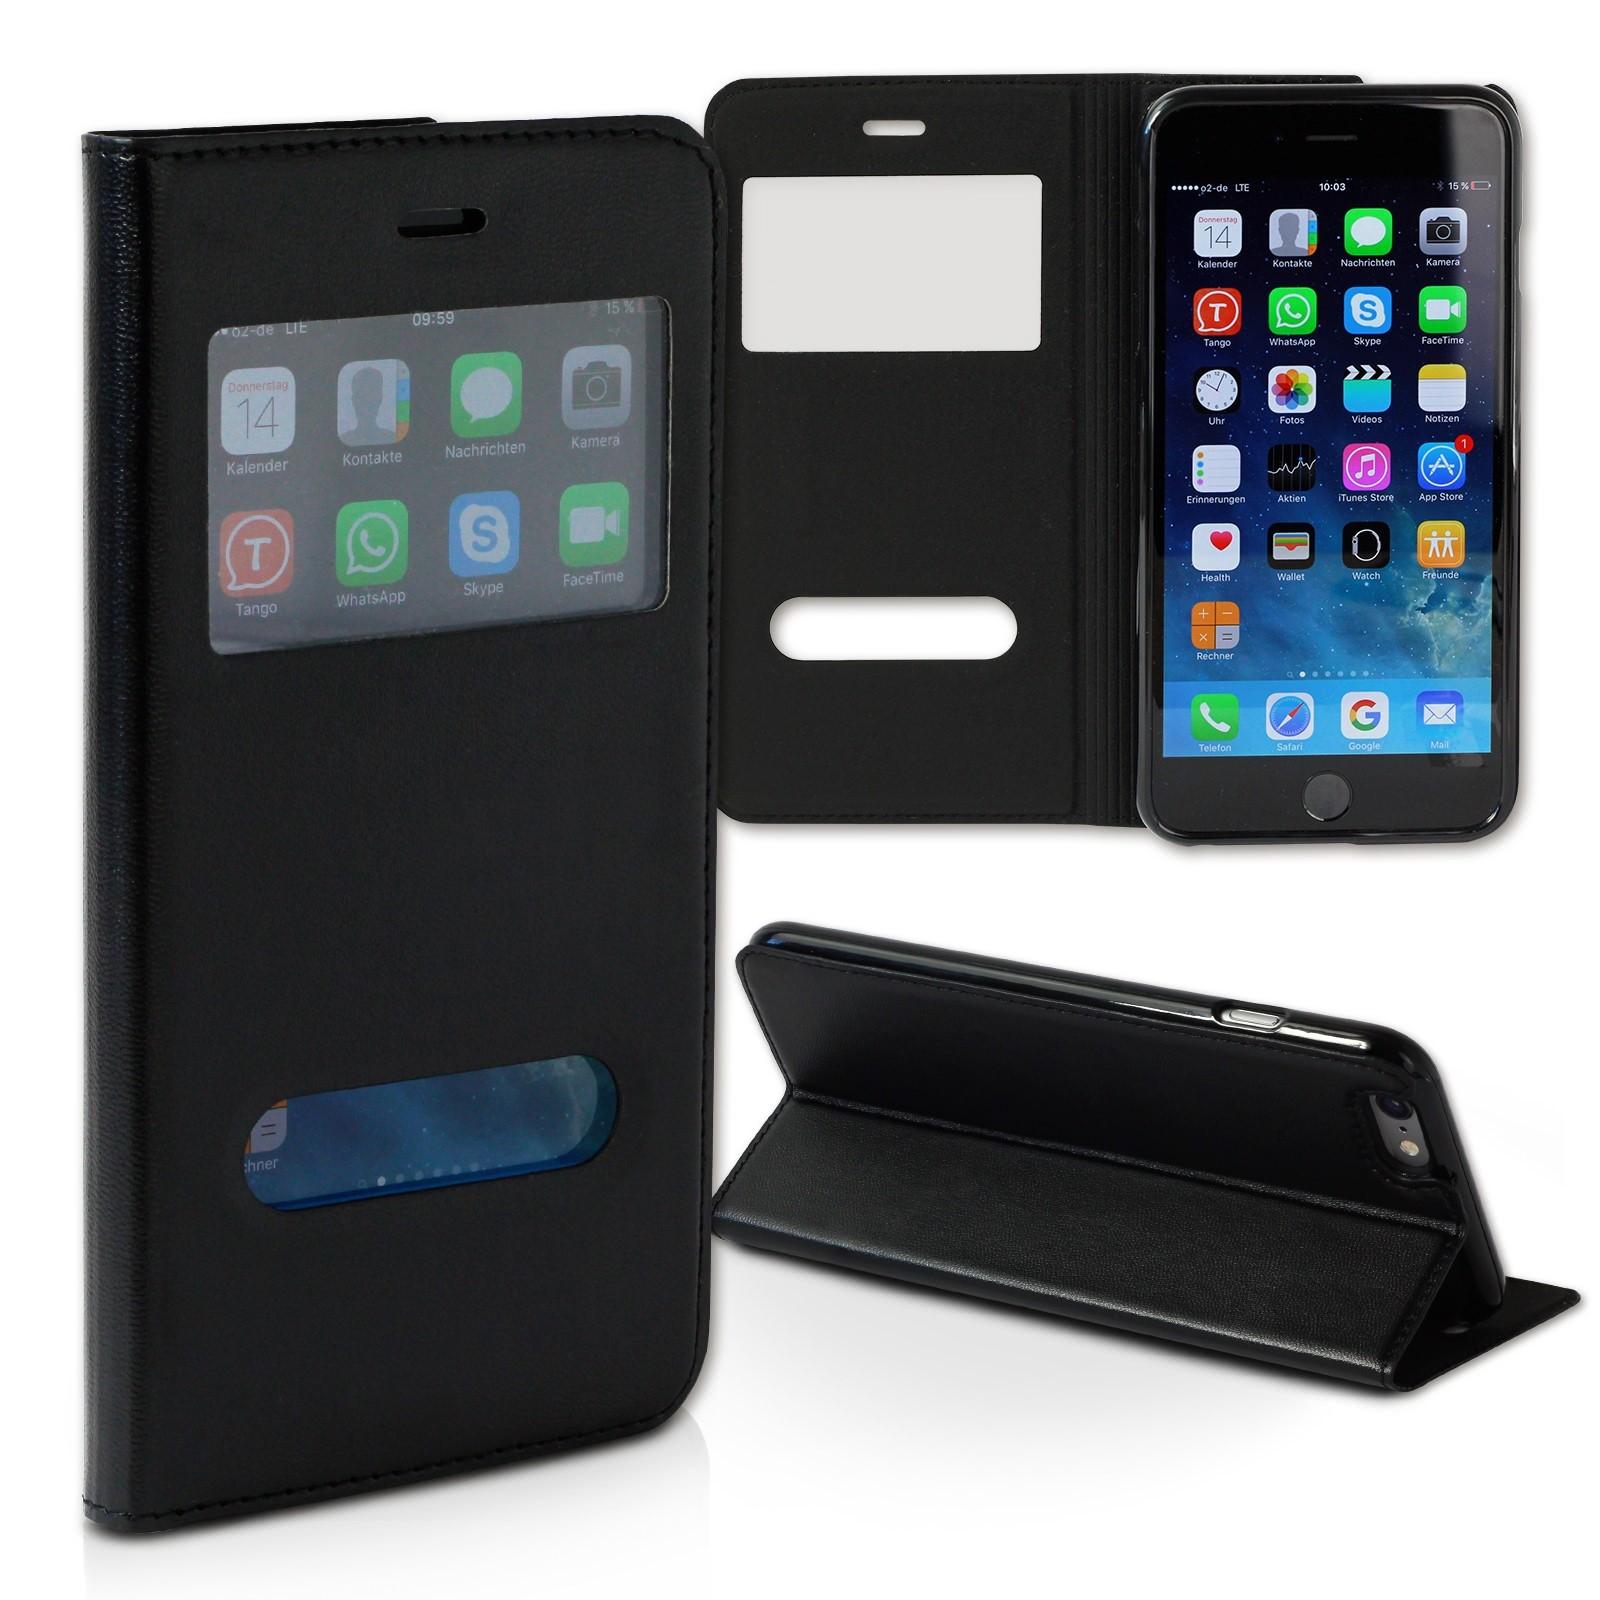 Handyhülle iPhone 6 schwarz Bookstyle Case Kunstleder DrachenLeder OME100S